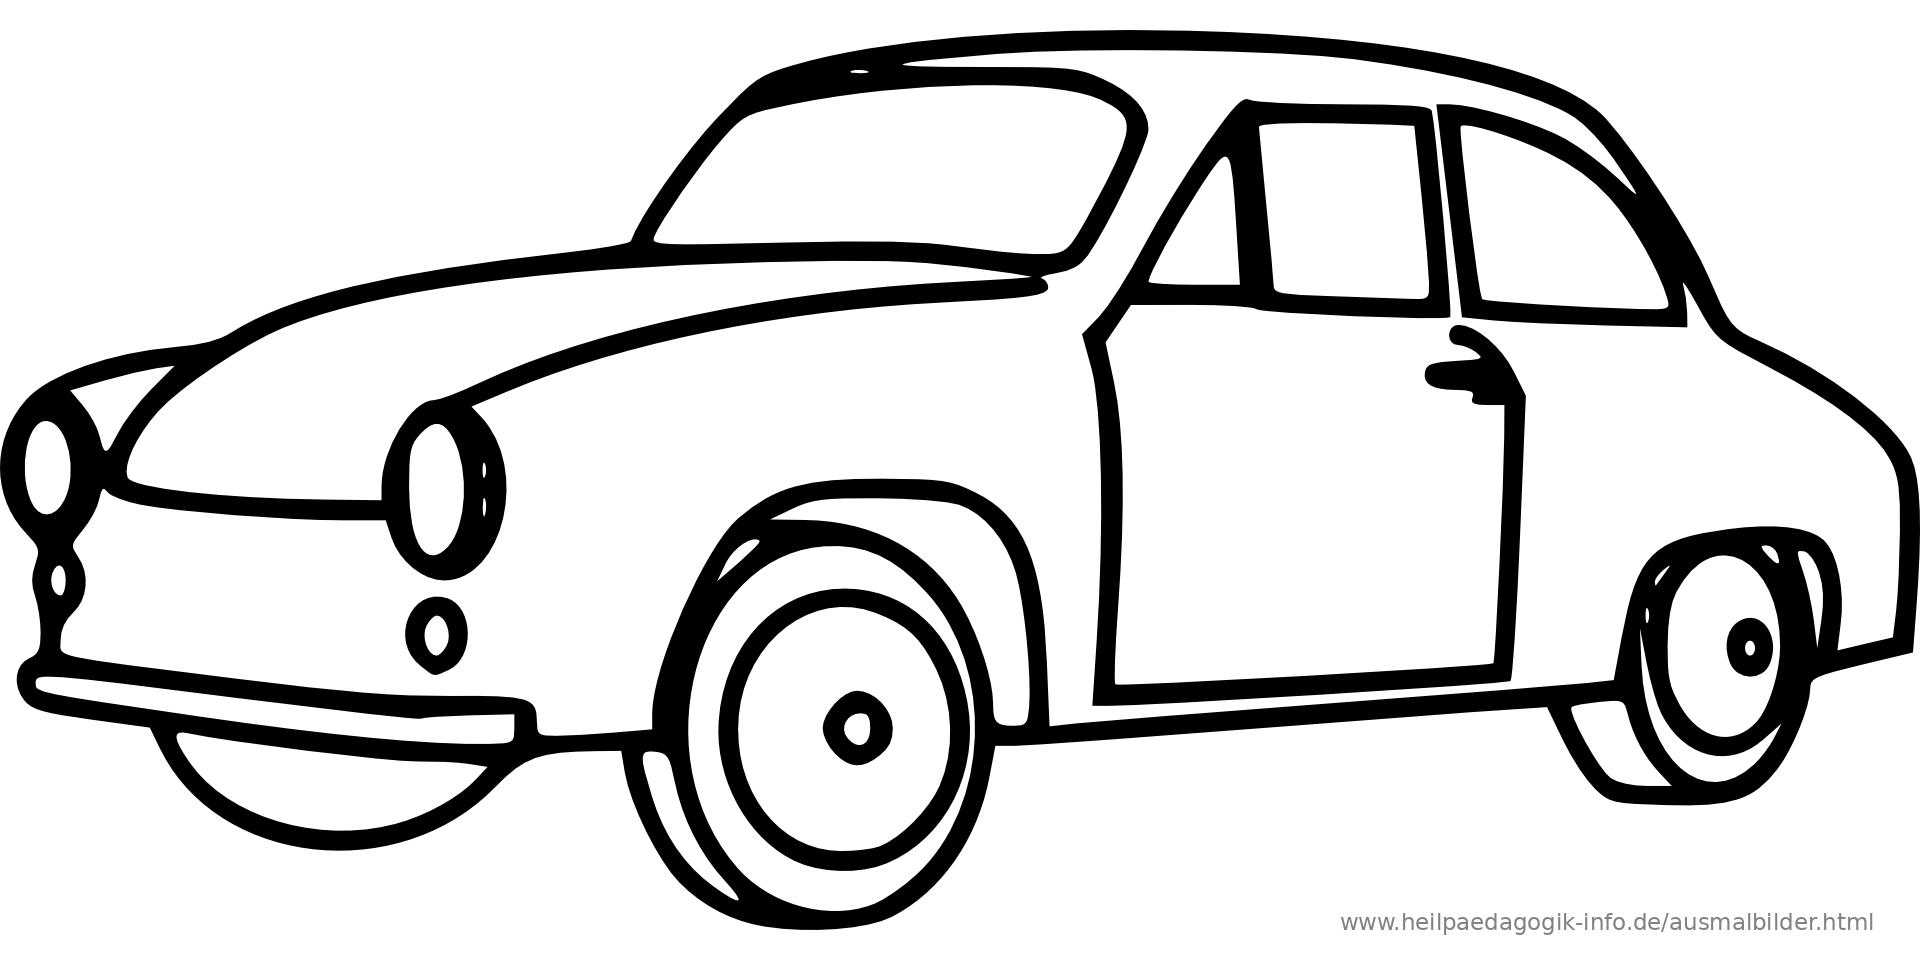 ausmalbilder autos kostenlos  ausmalbilder coloring pages